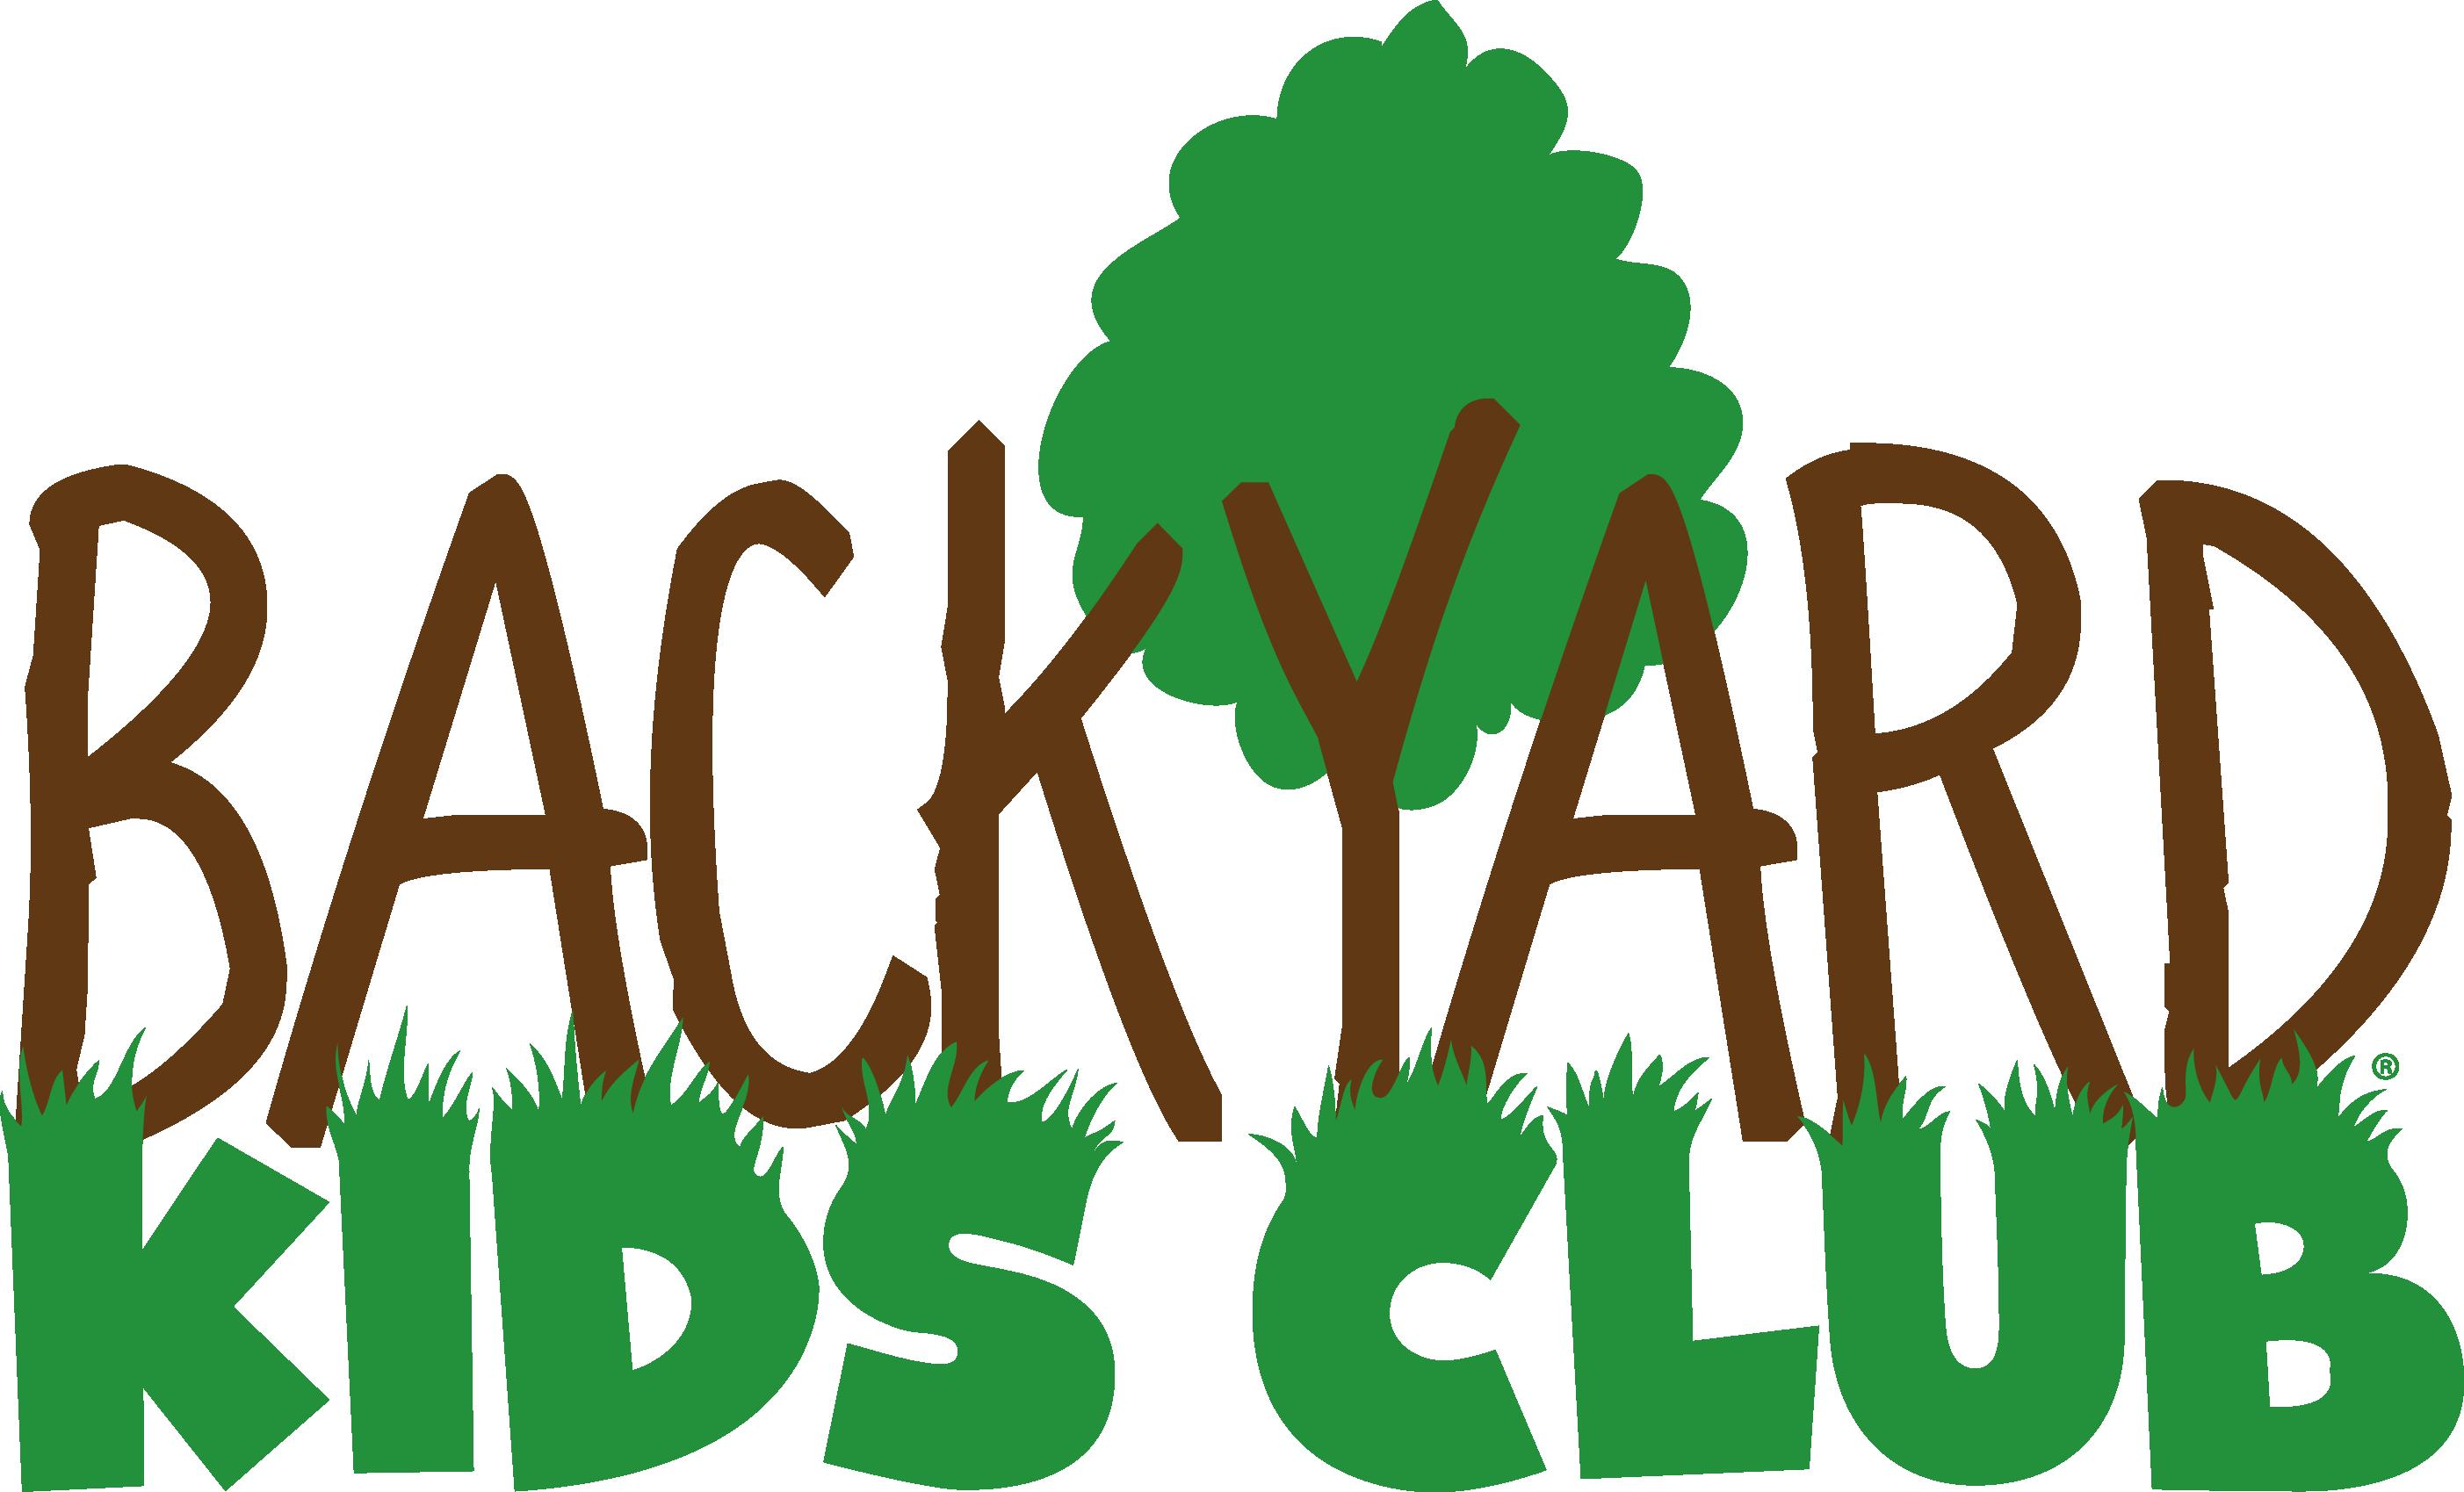 Free Backyard Cliparts, Download Free Clip Art, Free Clip.